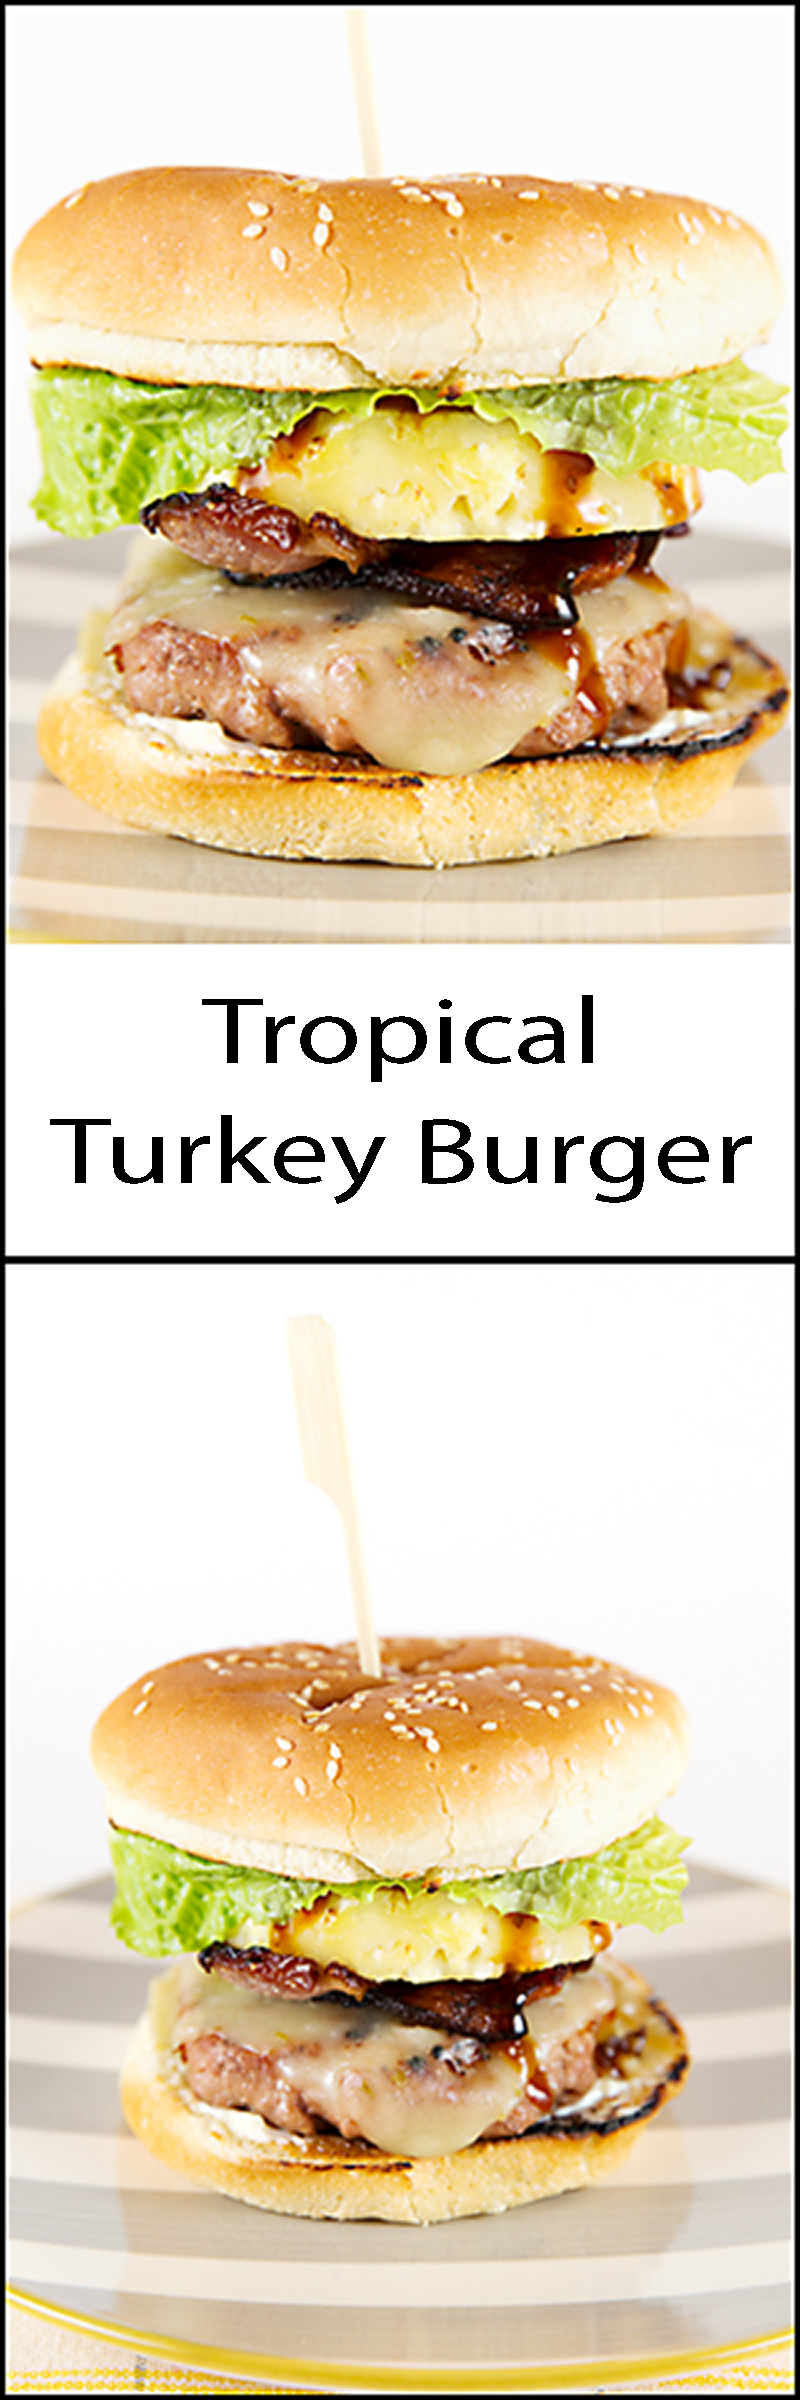 Tropical Turkey Burger